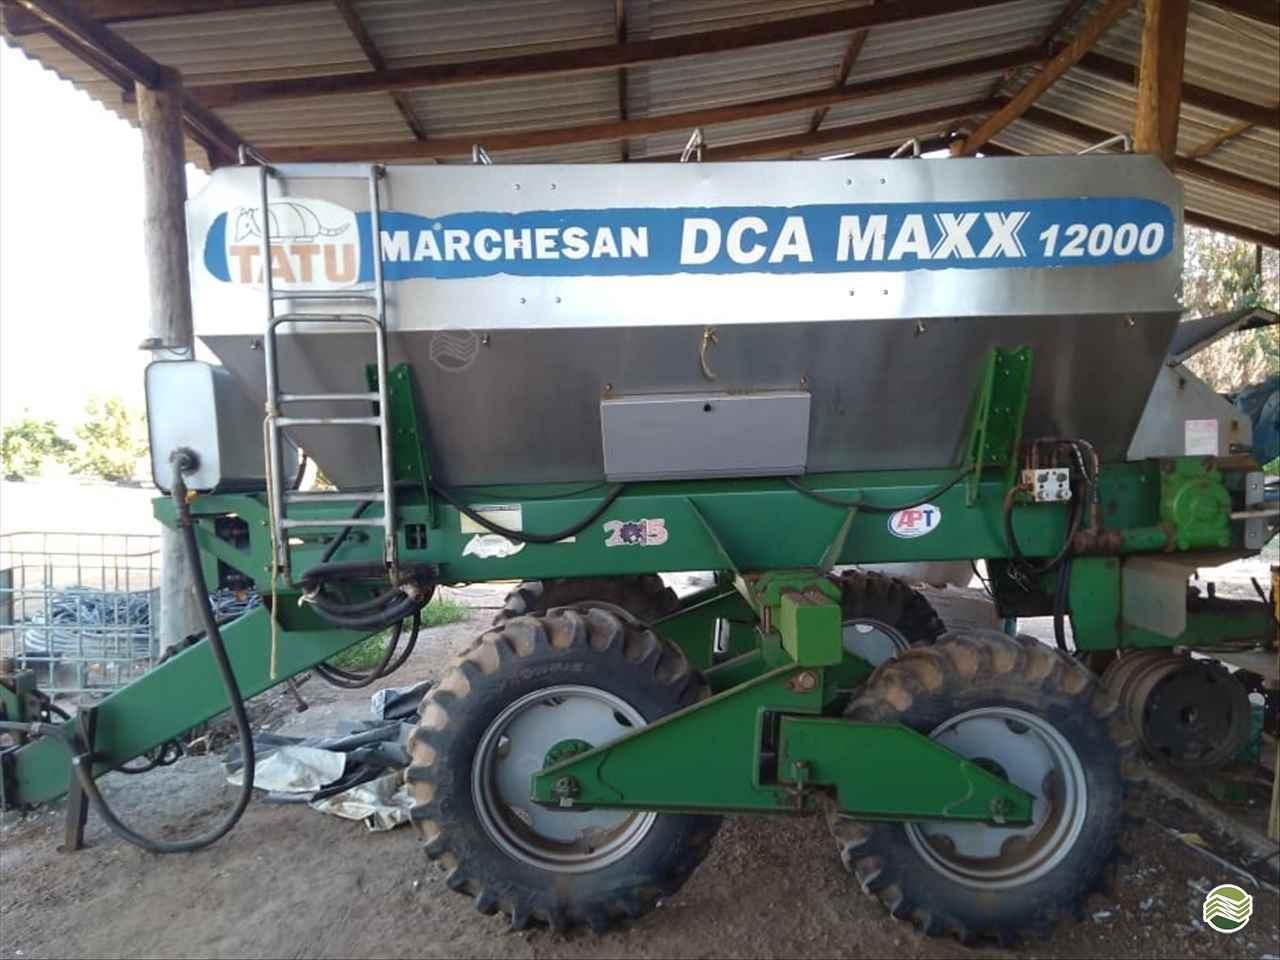 IMPLEMENTOS AGRICOLAS DISTRIBUIDOR CALCÁRIO 12000 Kg Rural Vendas TERRA ROXA PARANÁ PR